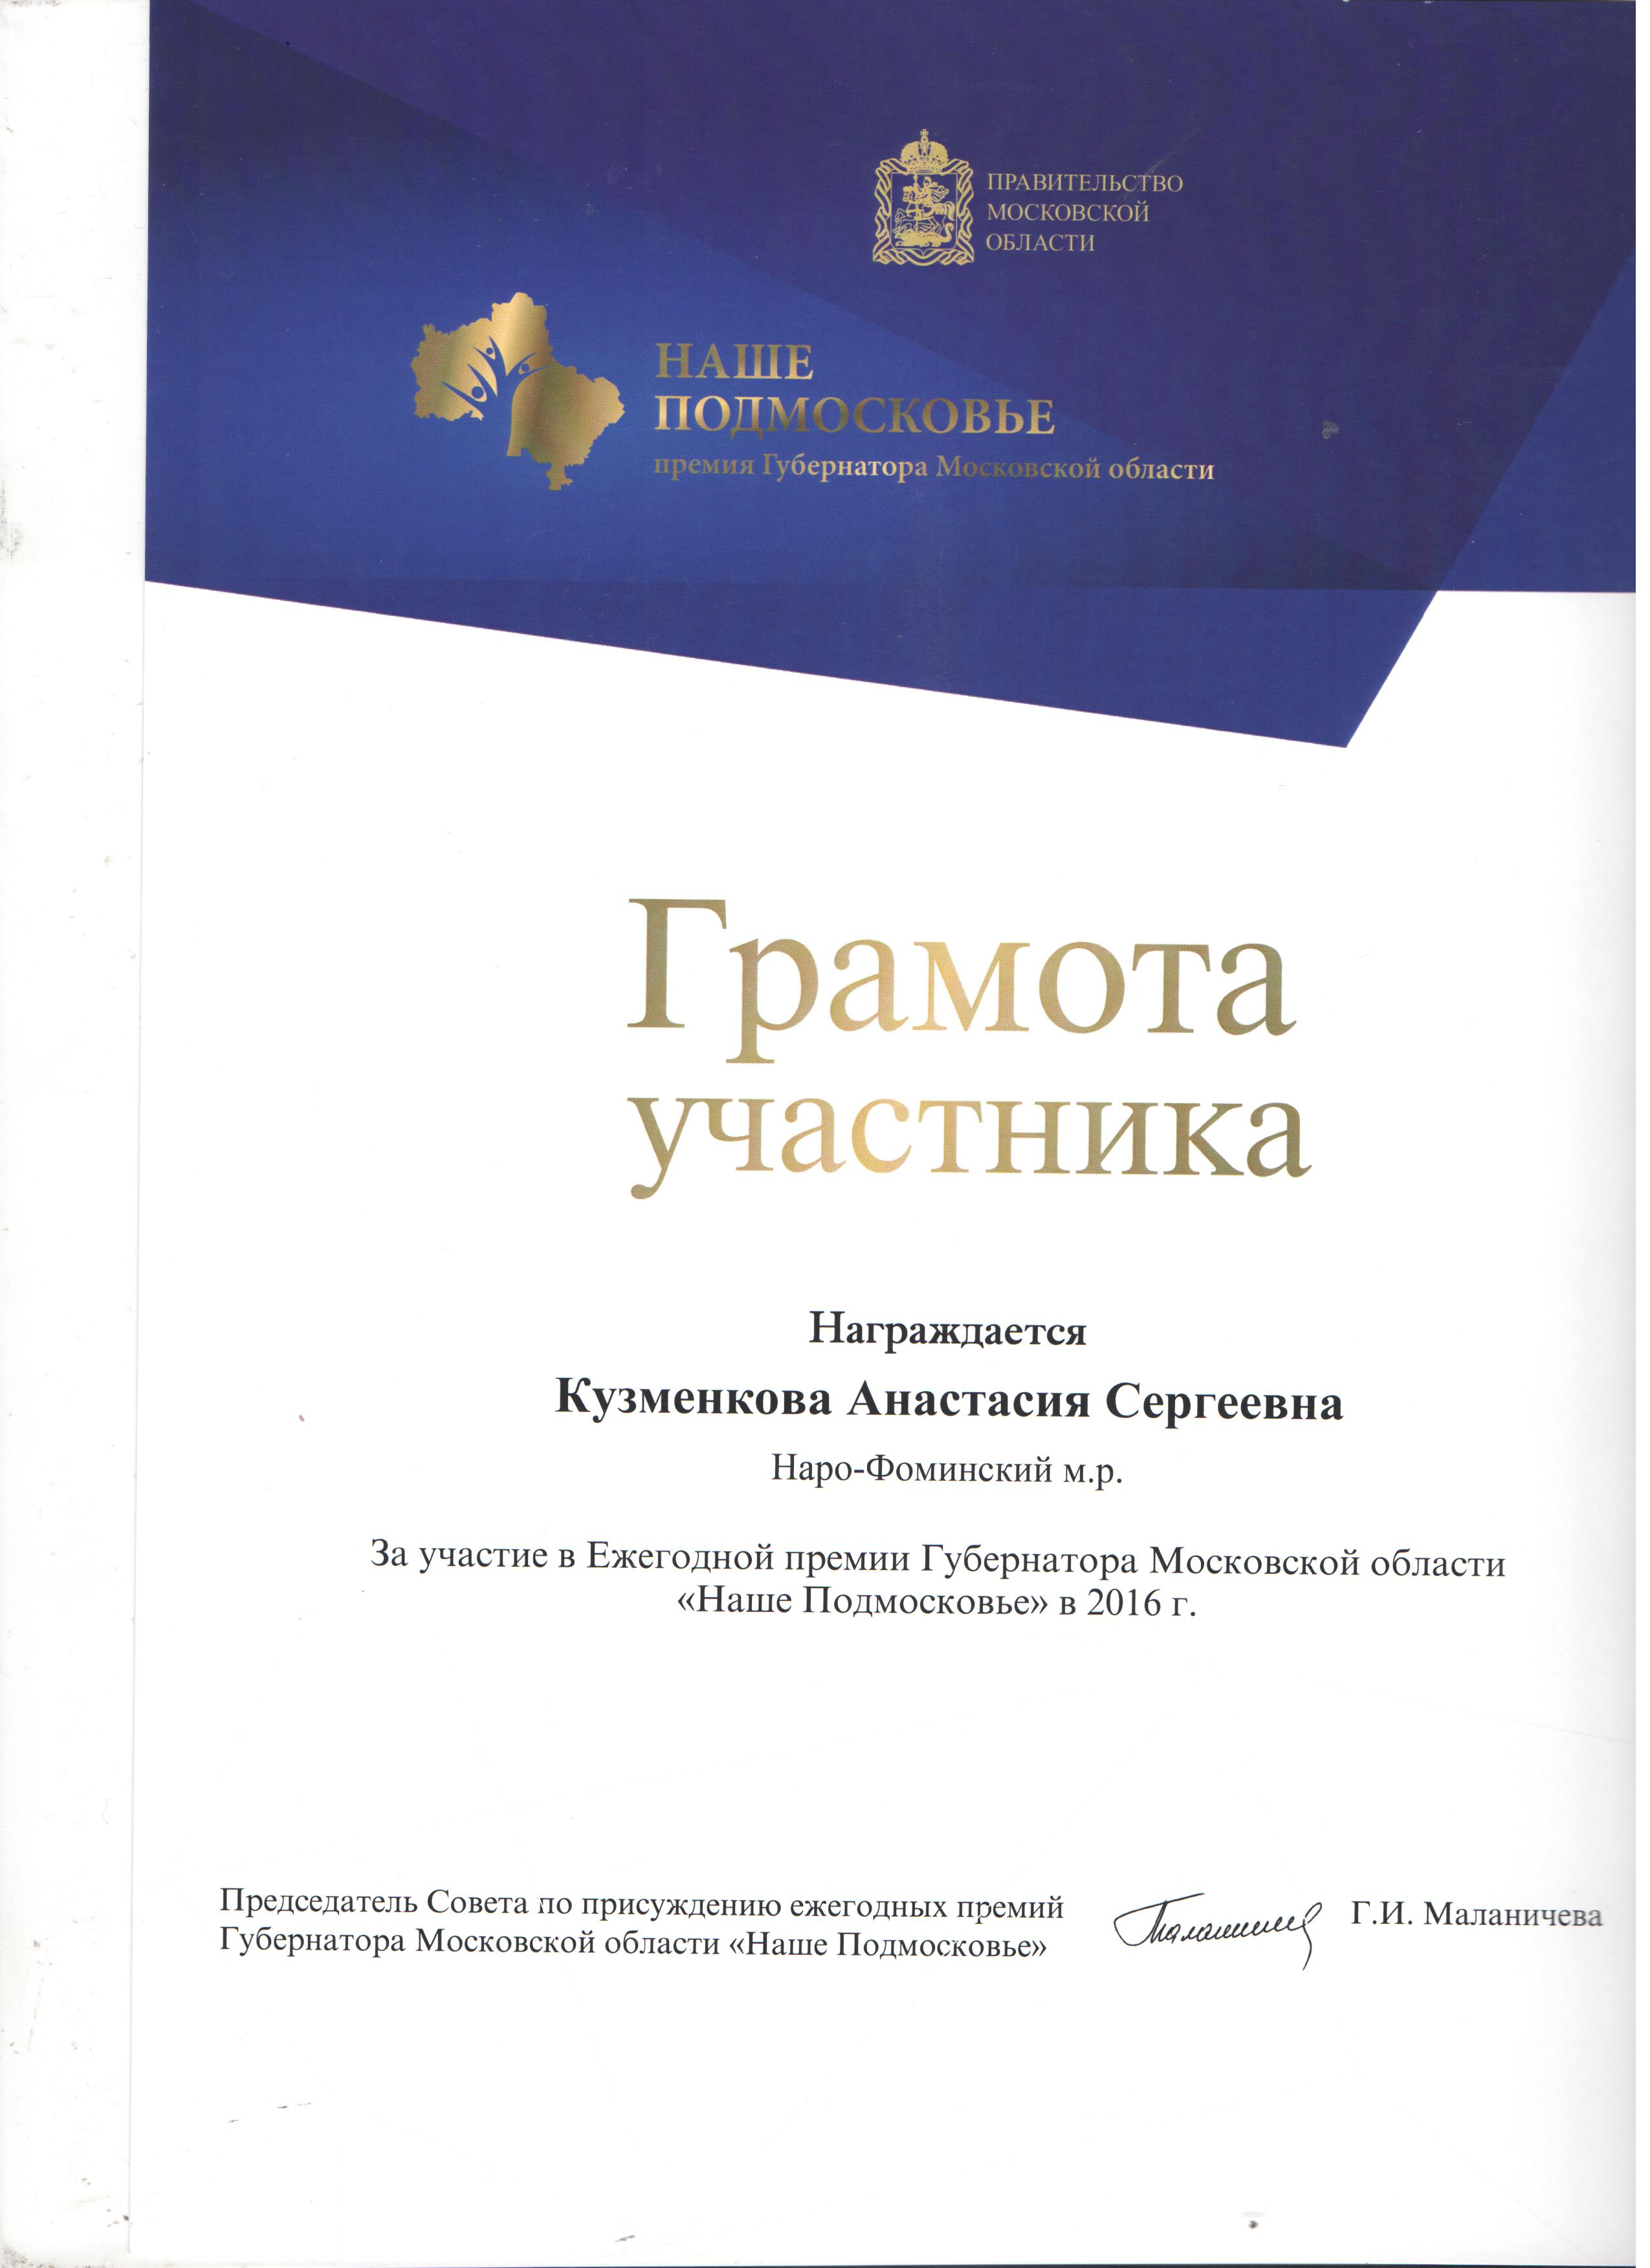 Кузменкова Анастасия Сергеевна